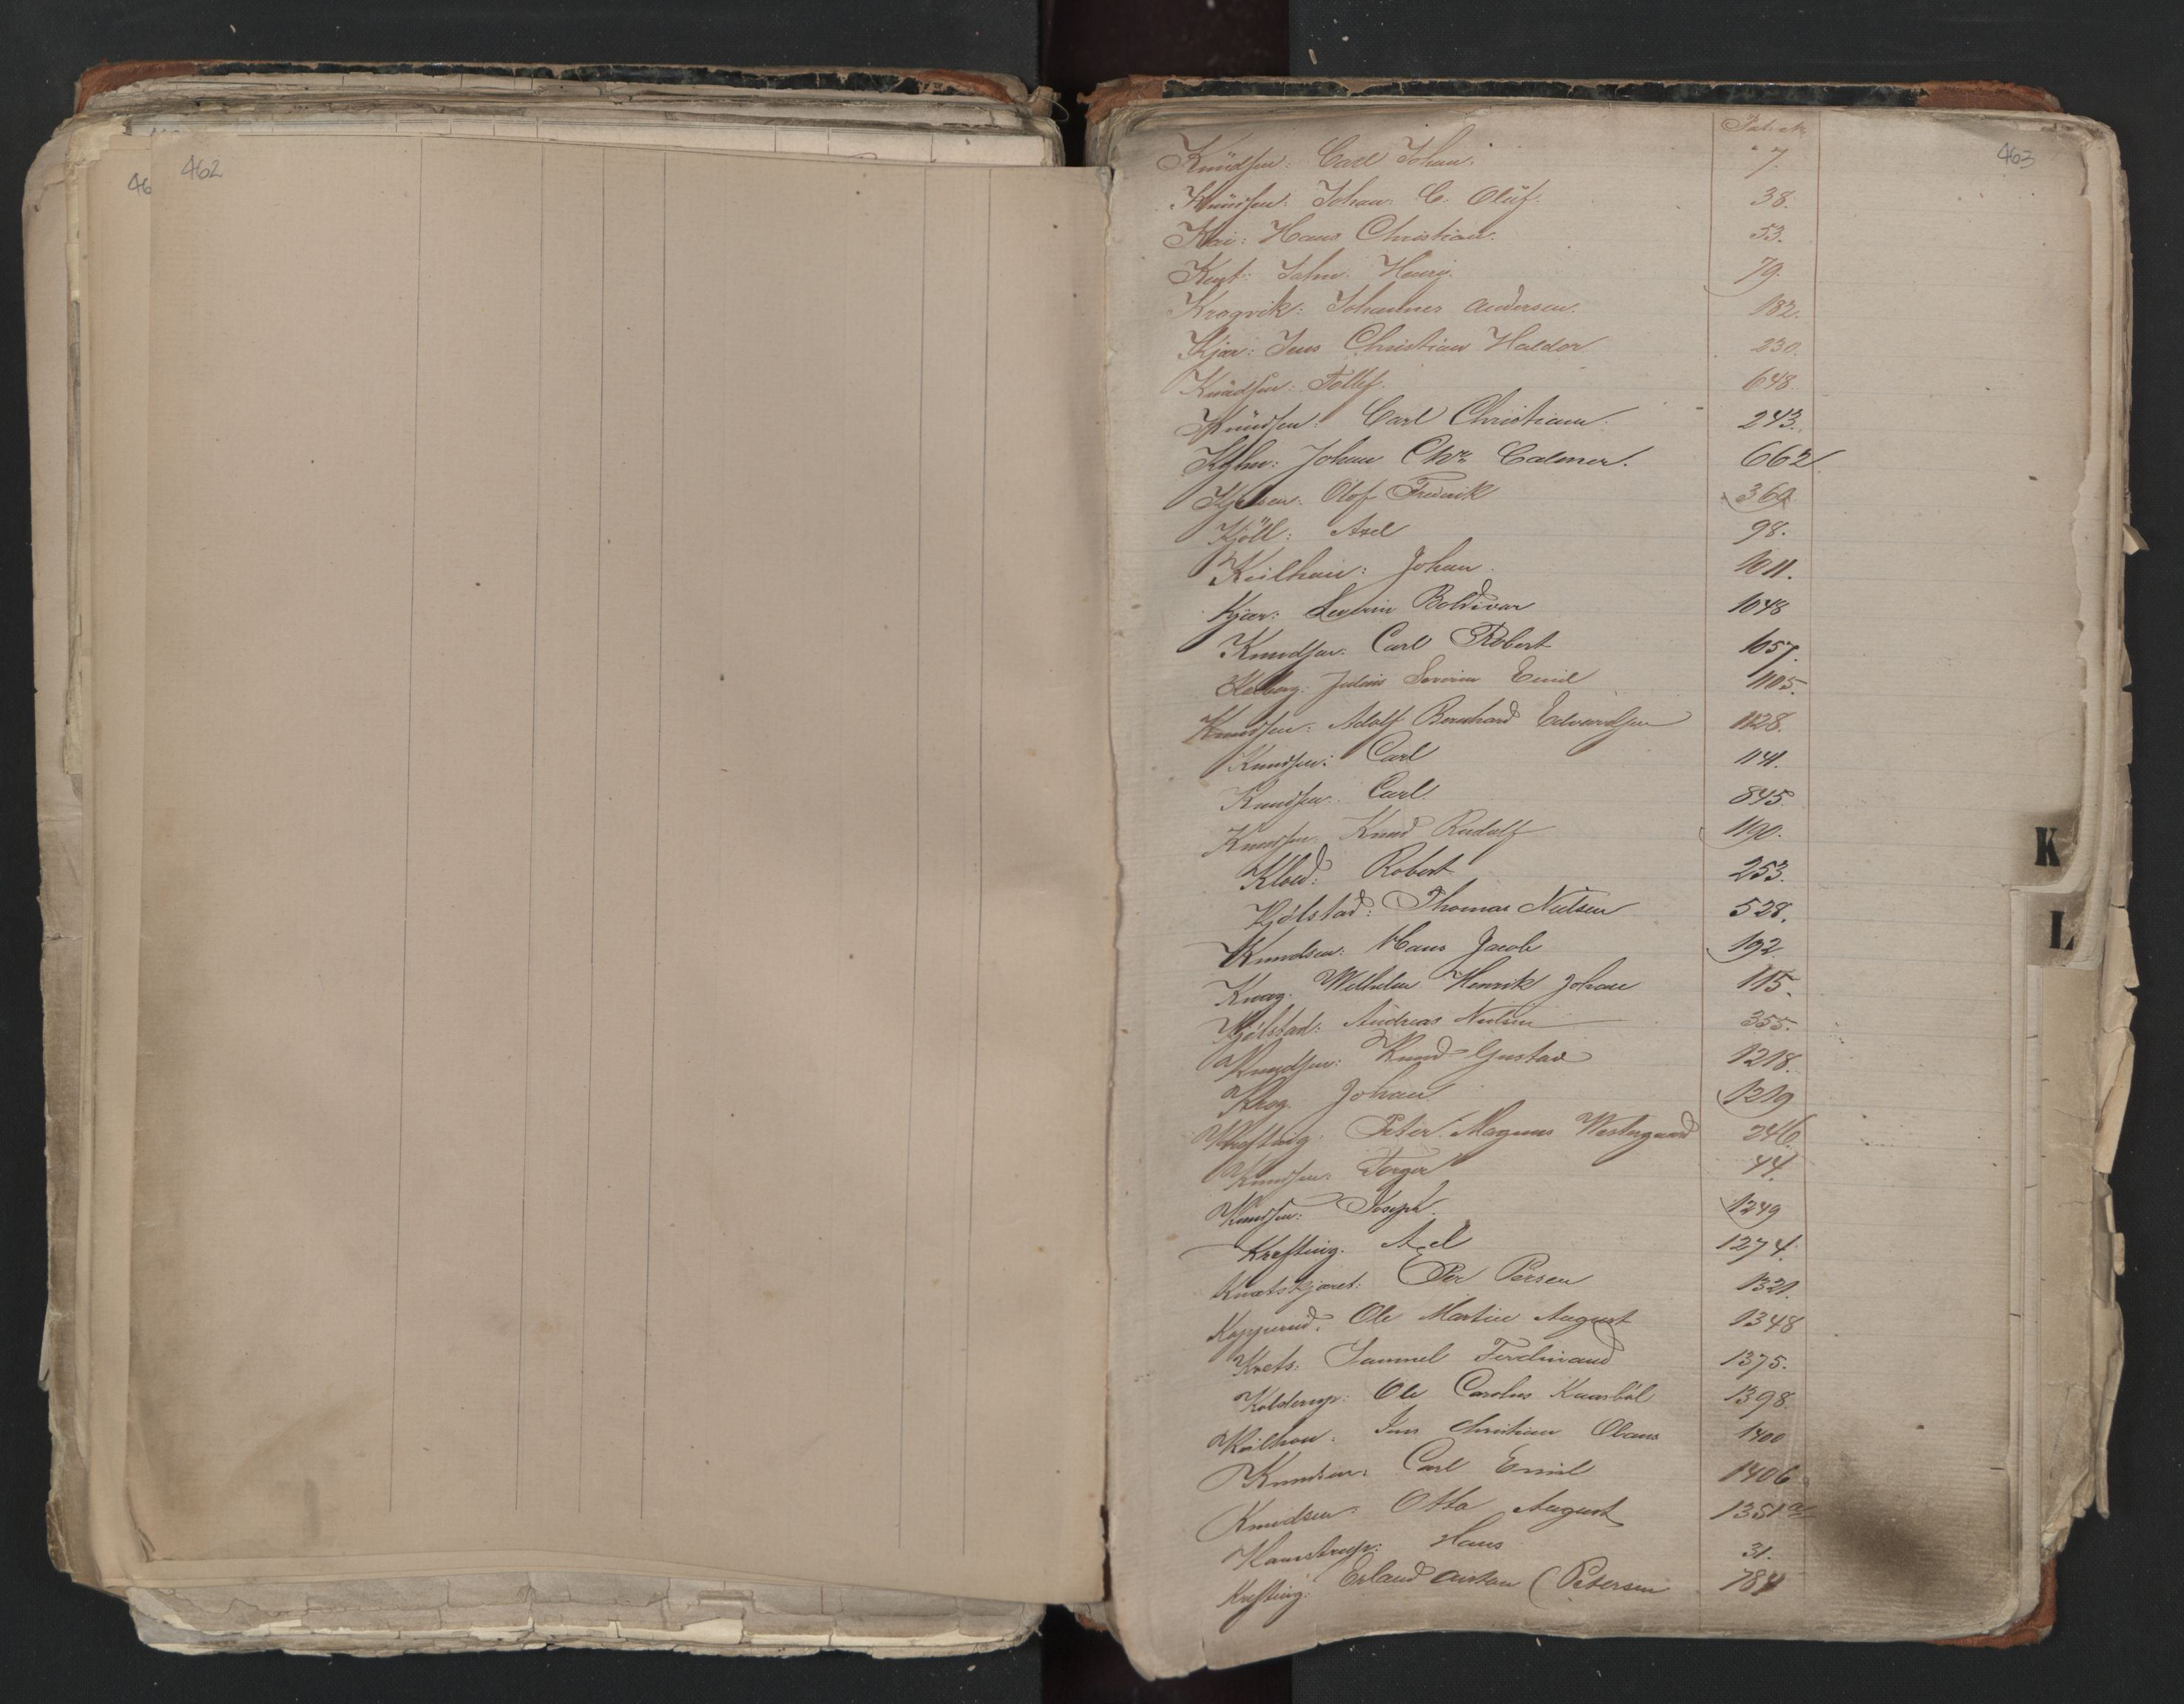 SAO, Oslo sjømannskontor, F/Fa/L0001: Register for Kristiania krets, 1866-1891, s. 462-463